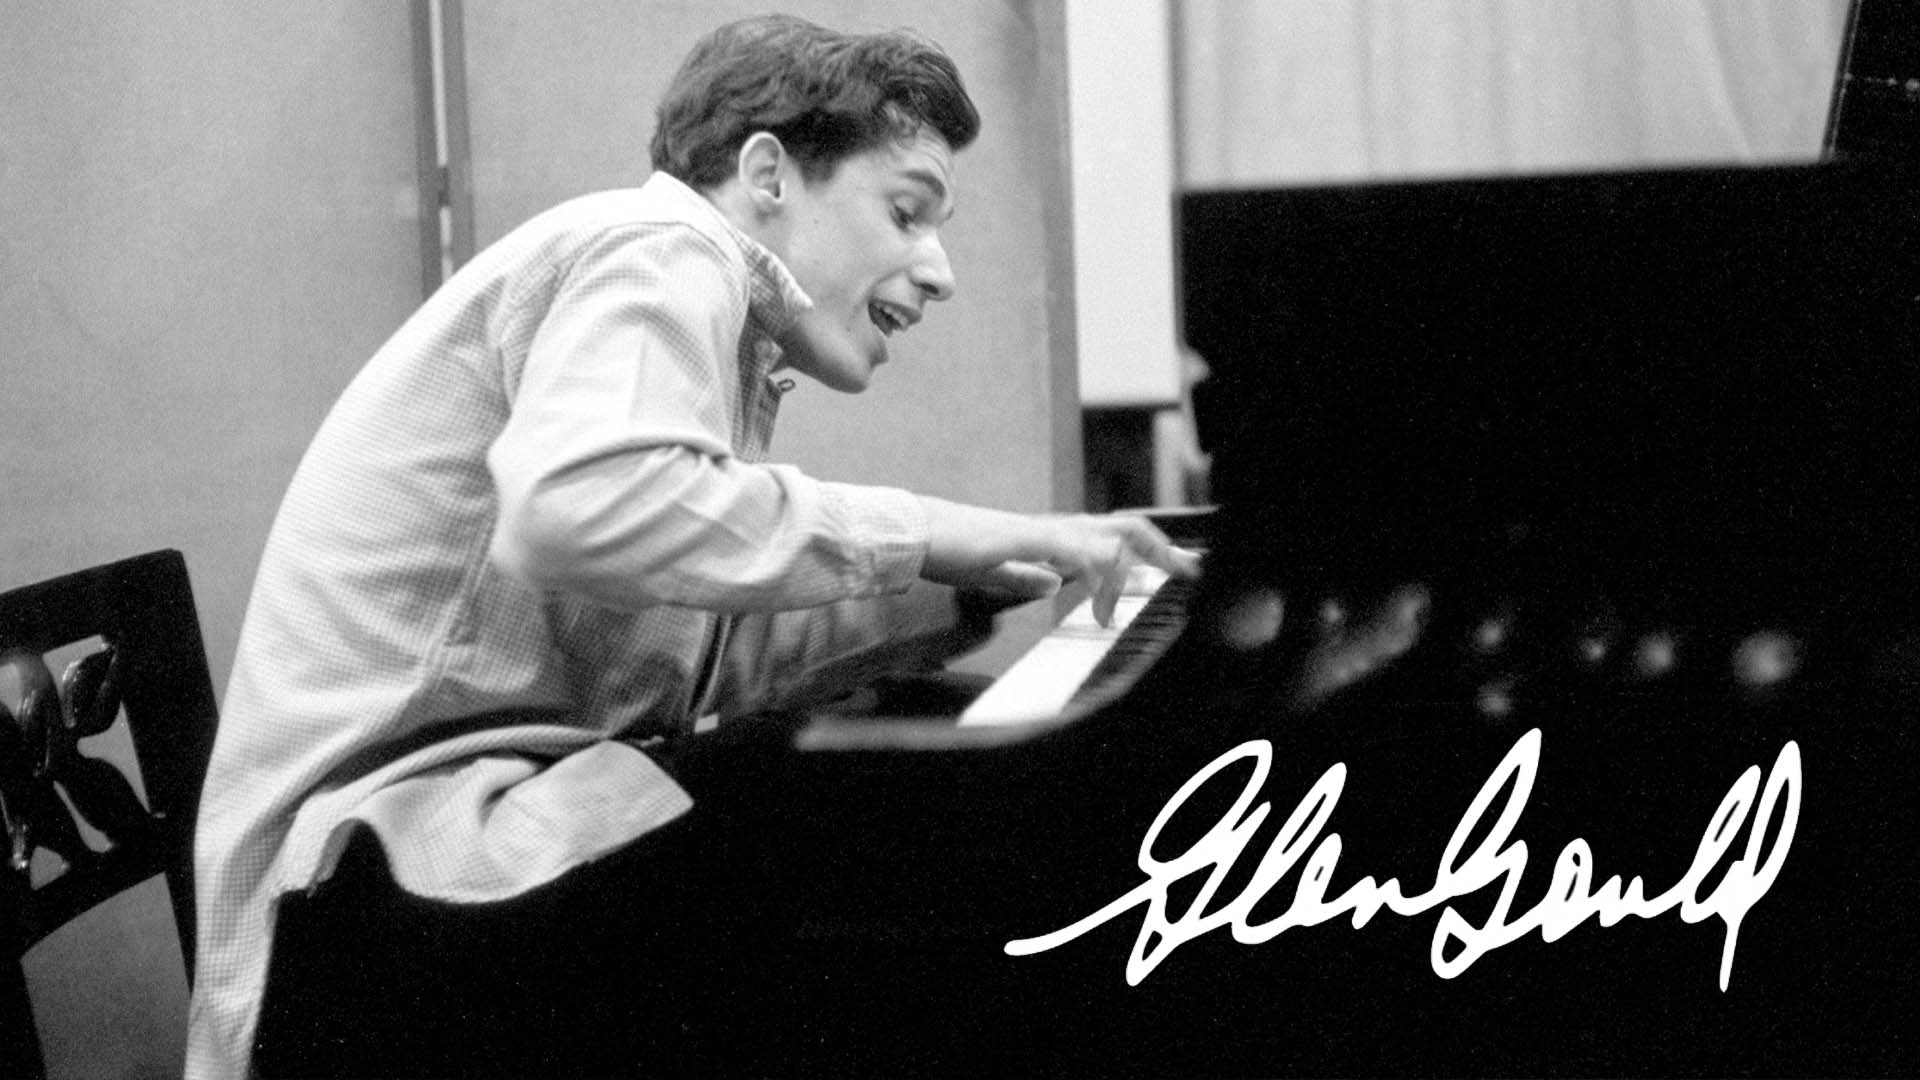 Glenn-Gould-1920x1080-ccs-slider